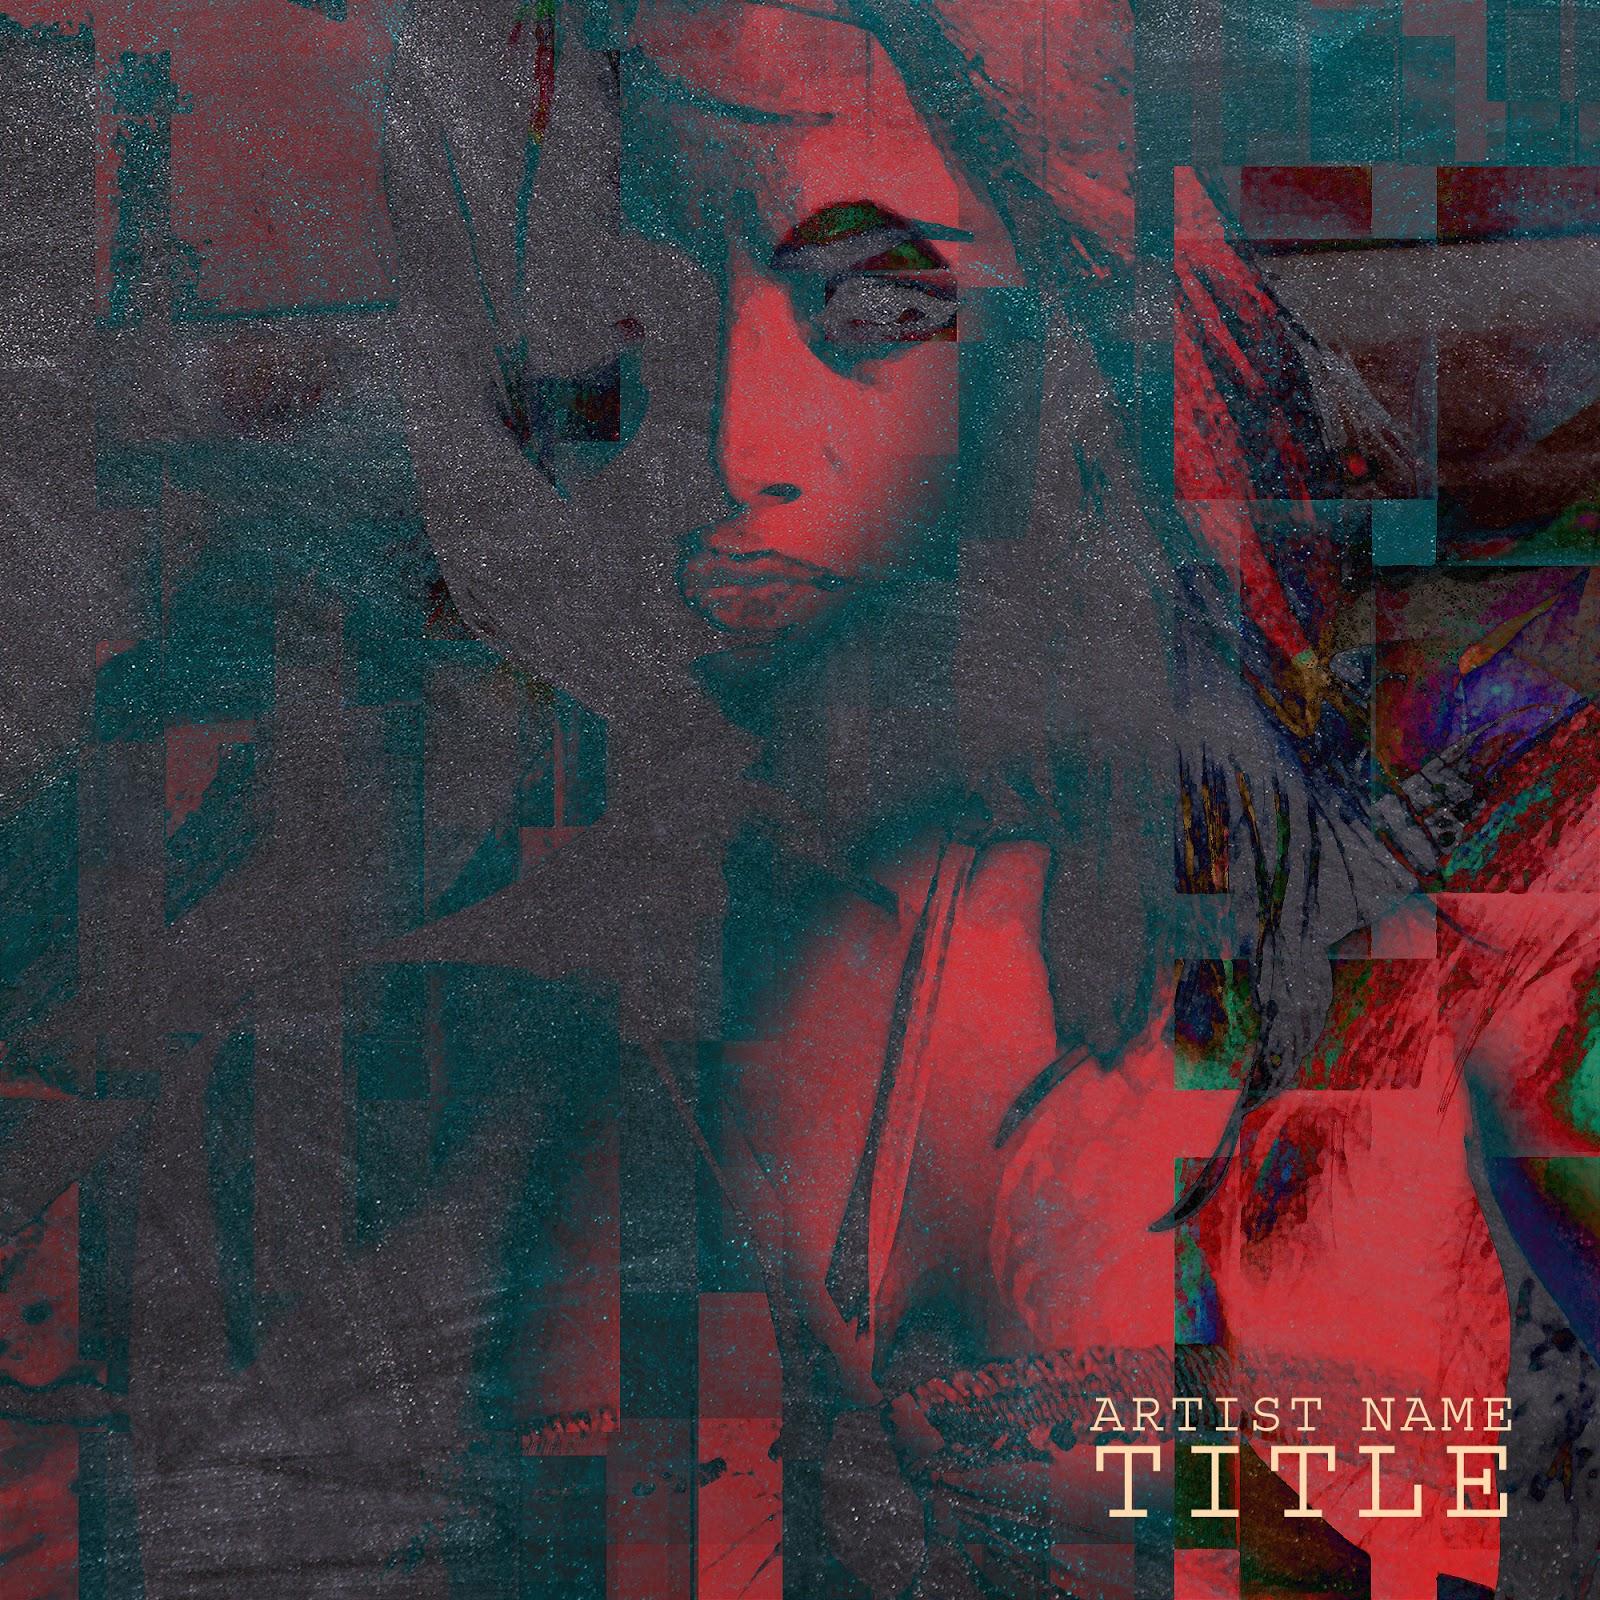 Arts Live Song Room: Music Single/album/mixtape/CD Cover Artwork Graphic Design